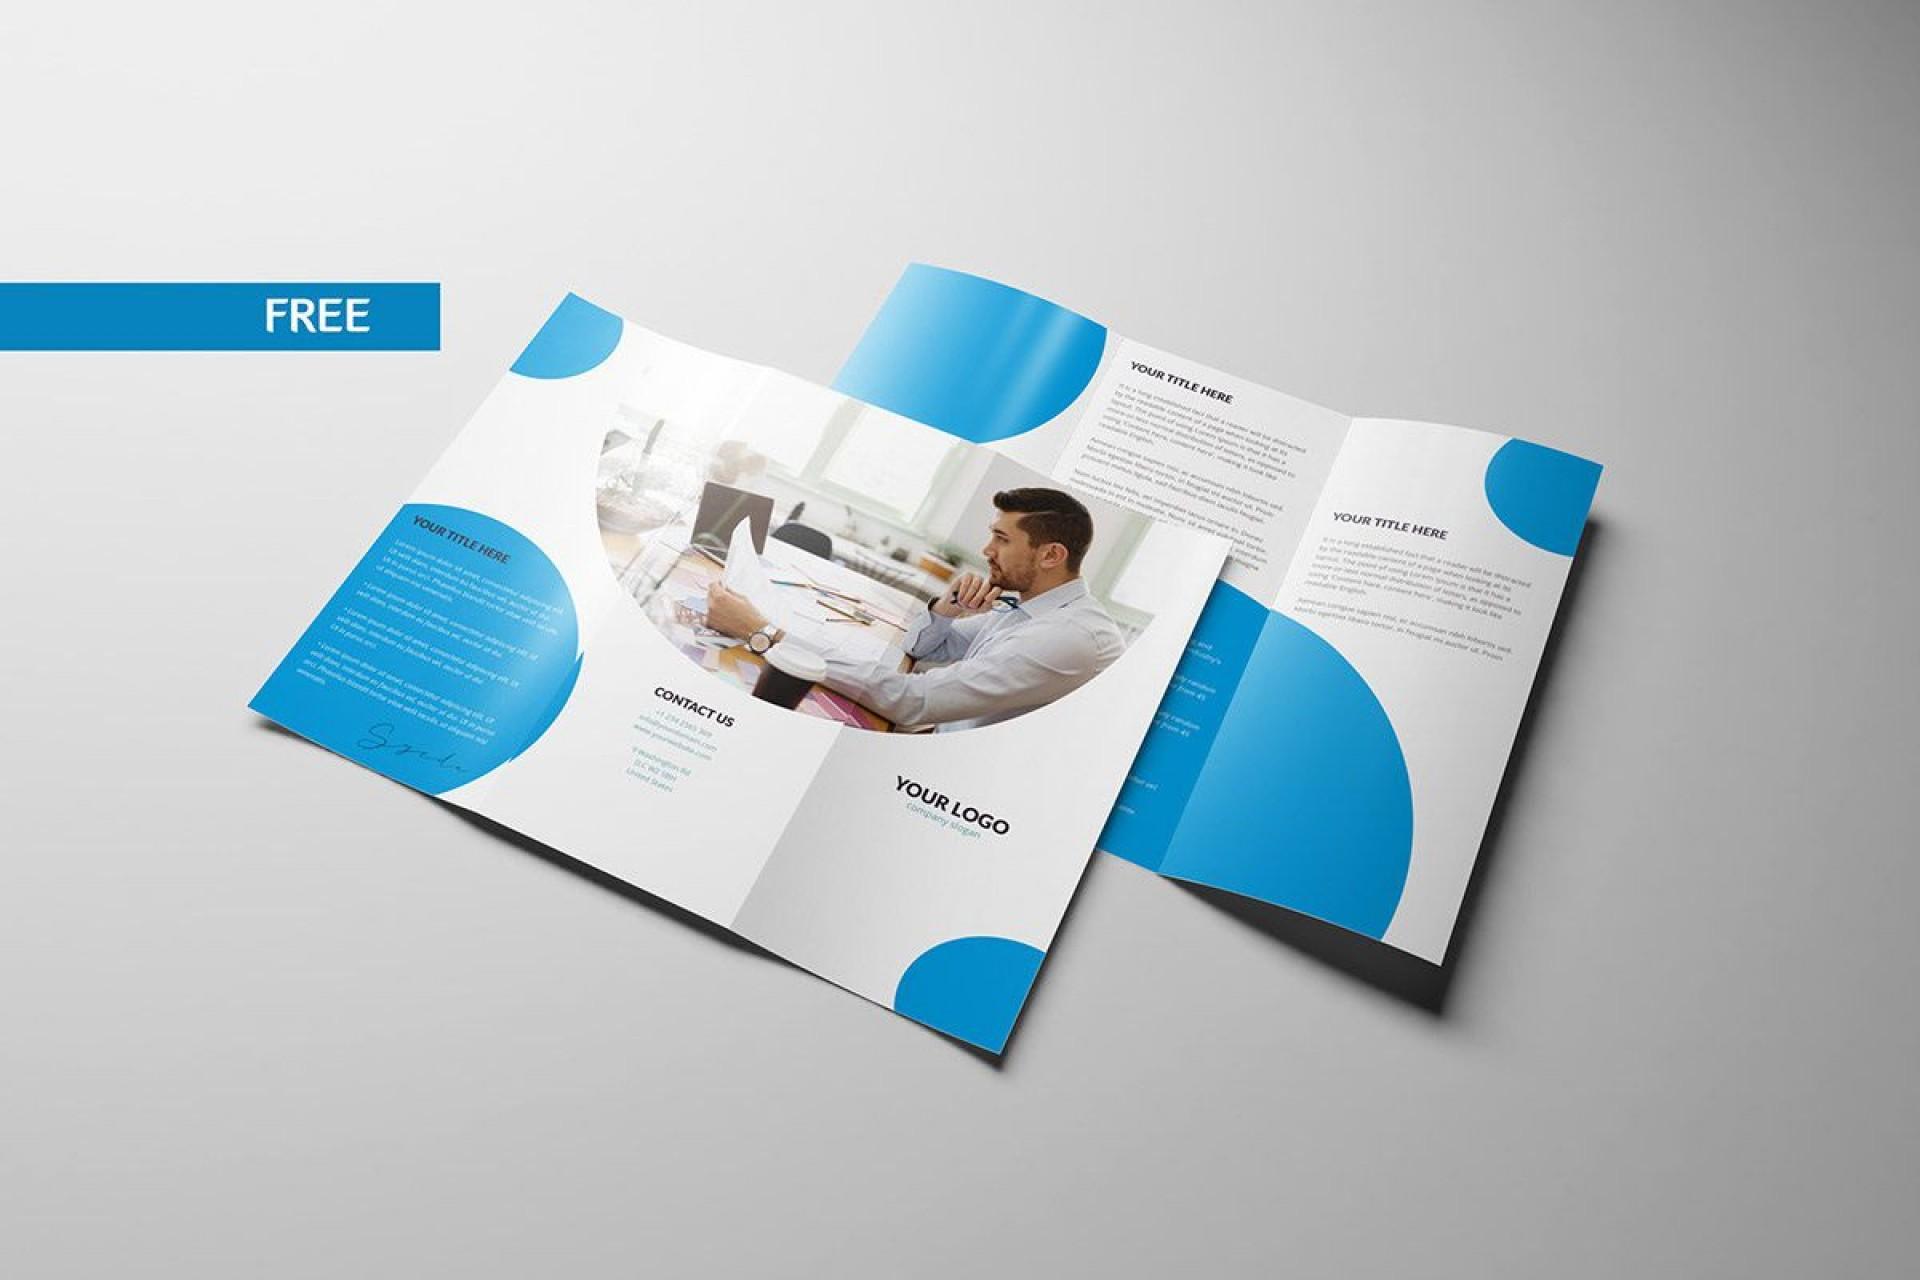 003 Beautiful Free Tri Fold Brochure Template Photo  Photoshop Illustrator Microsoft Word 20101920